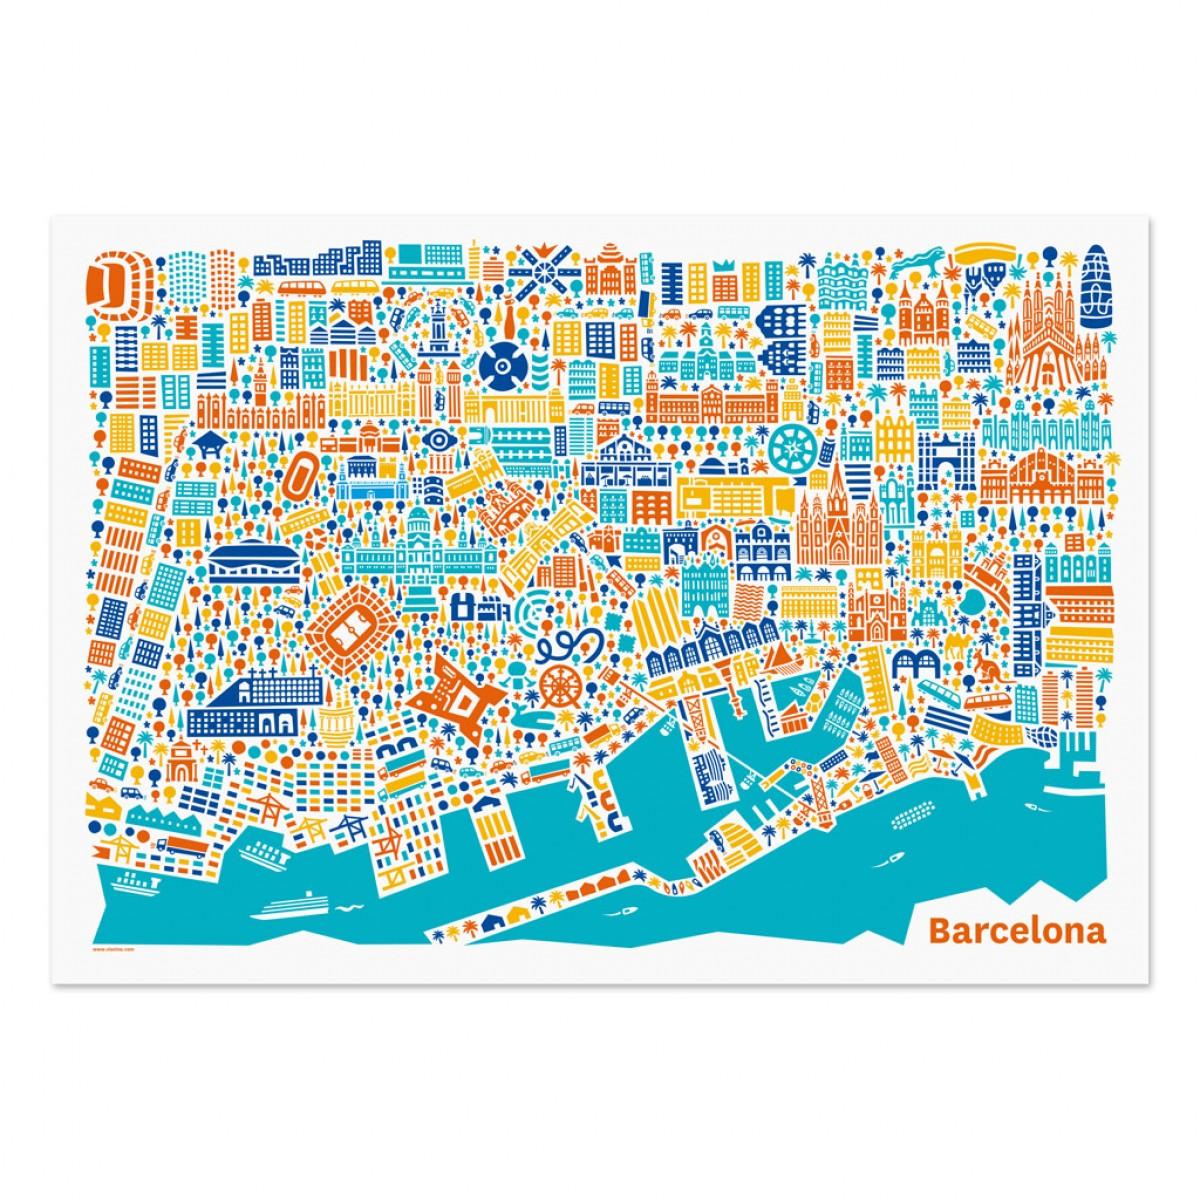 Vianina Barcelona Poster 70 x 50